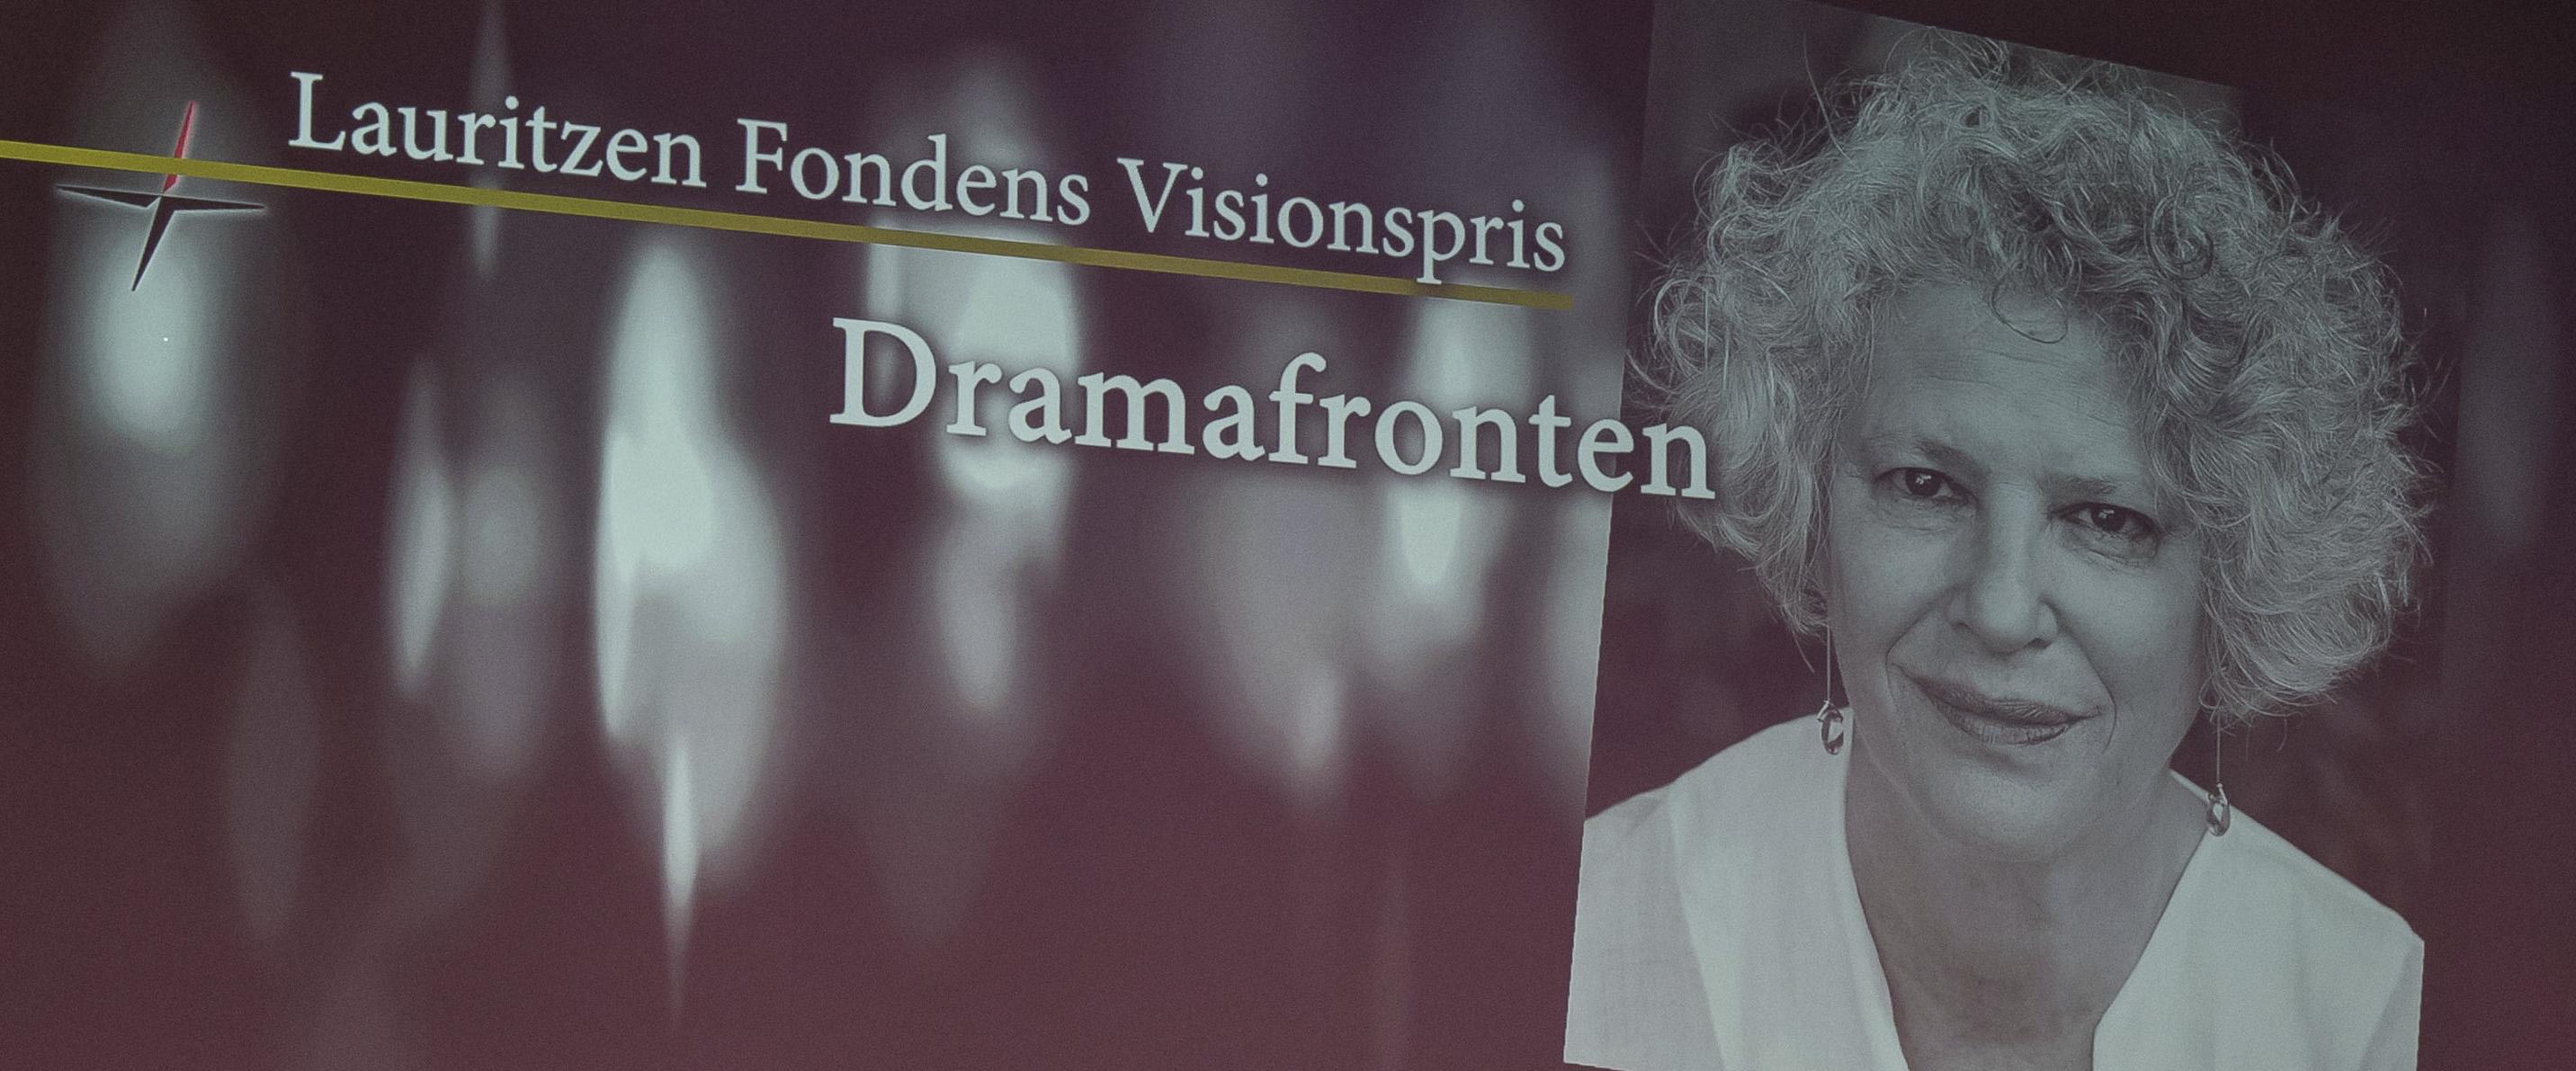 1140x474_Lauritzen Fondens Visionspris 2018 - Foto: Søren Kløft